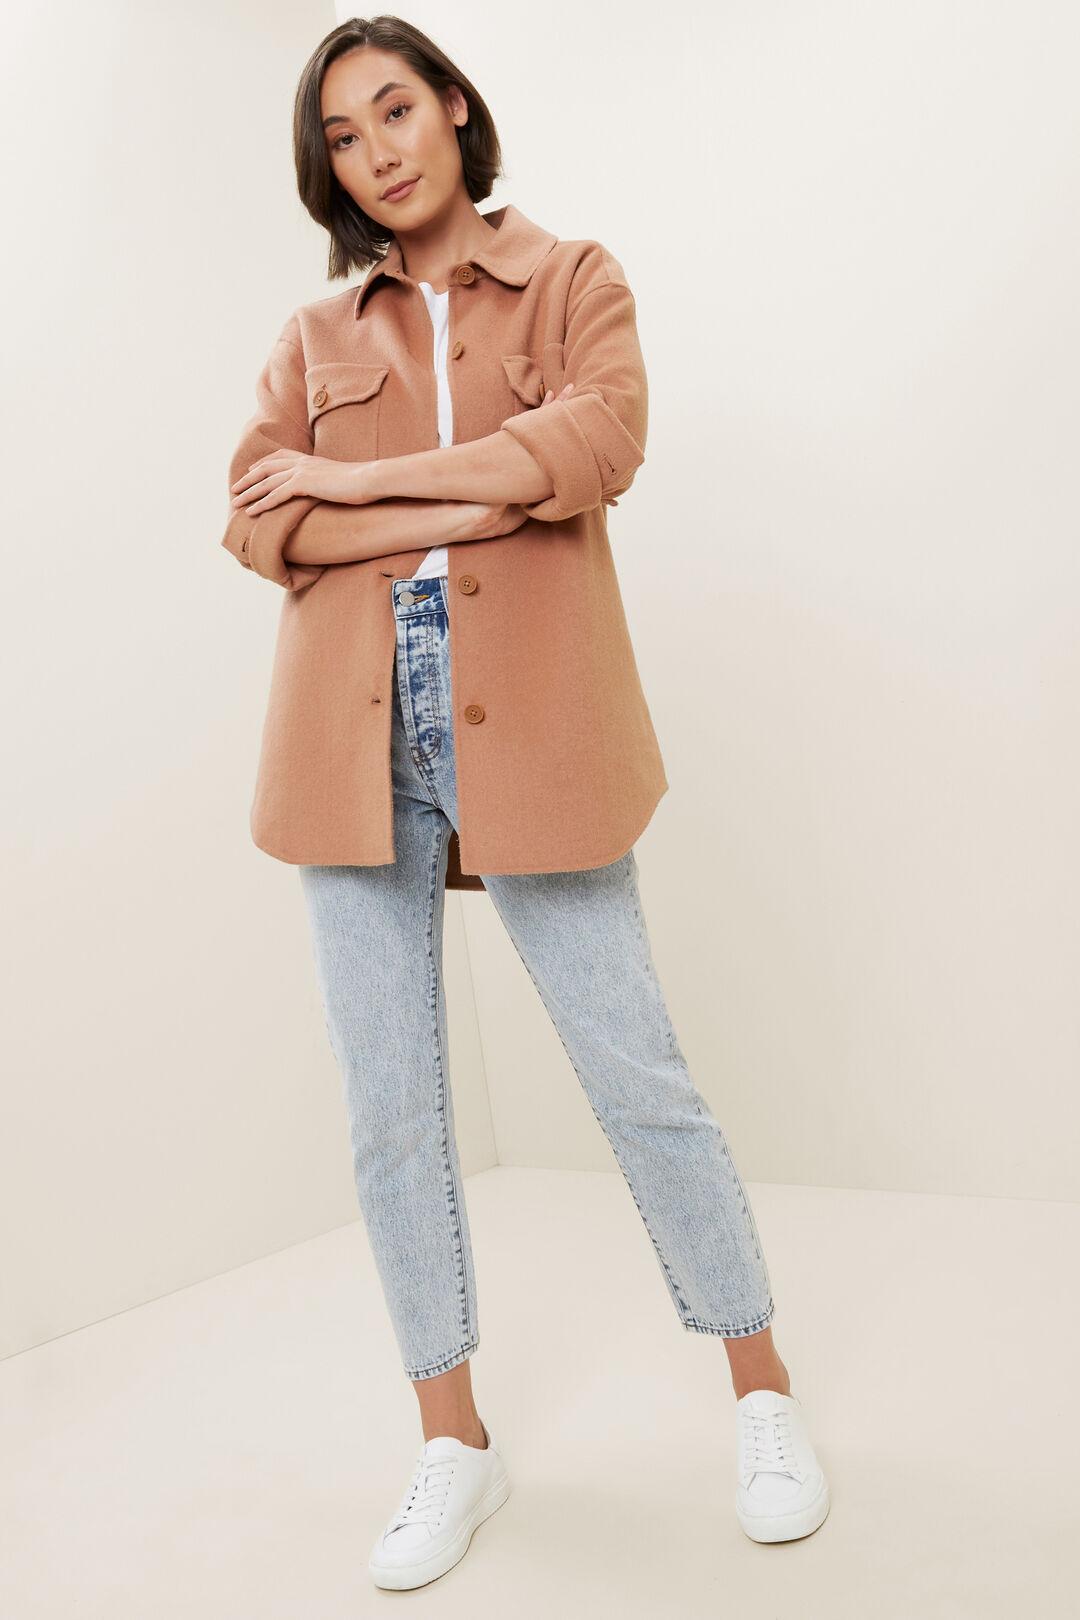 Overshirt Jacket  BURNT SIENNA  hi-res